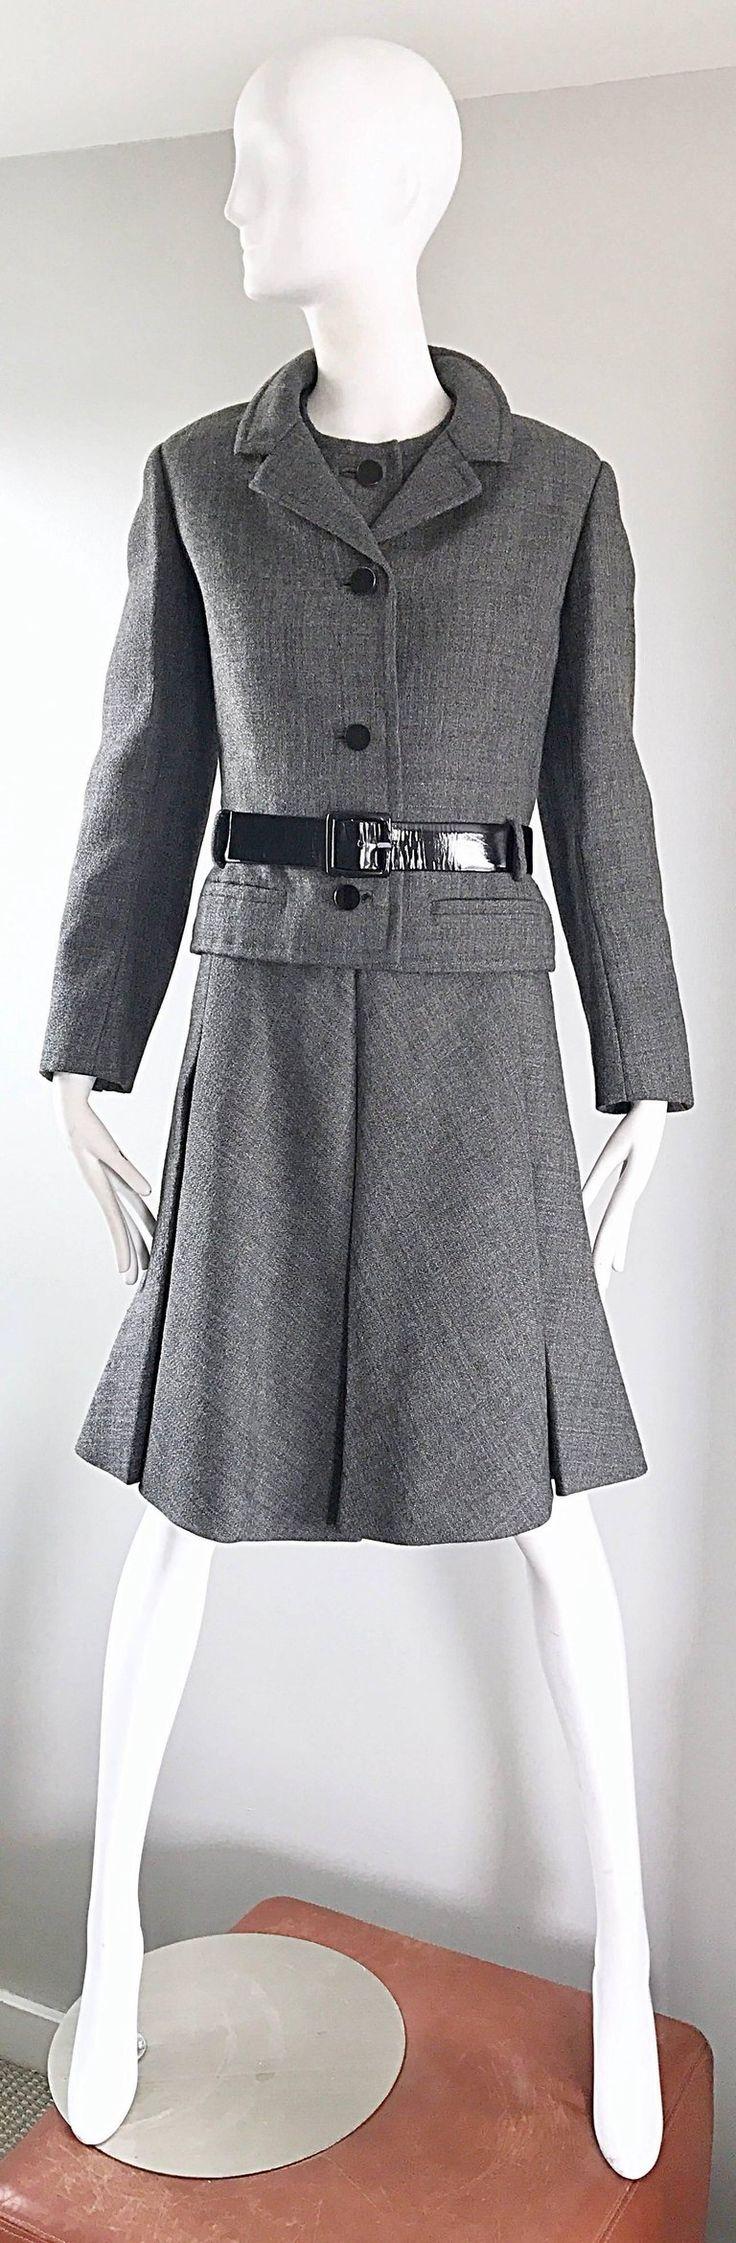 1960s Nina Ricci Haute Couture Vintage Grey Wool Dress and Jacket 60s Ensemble